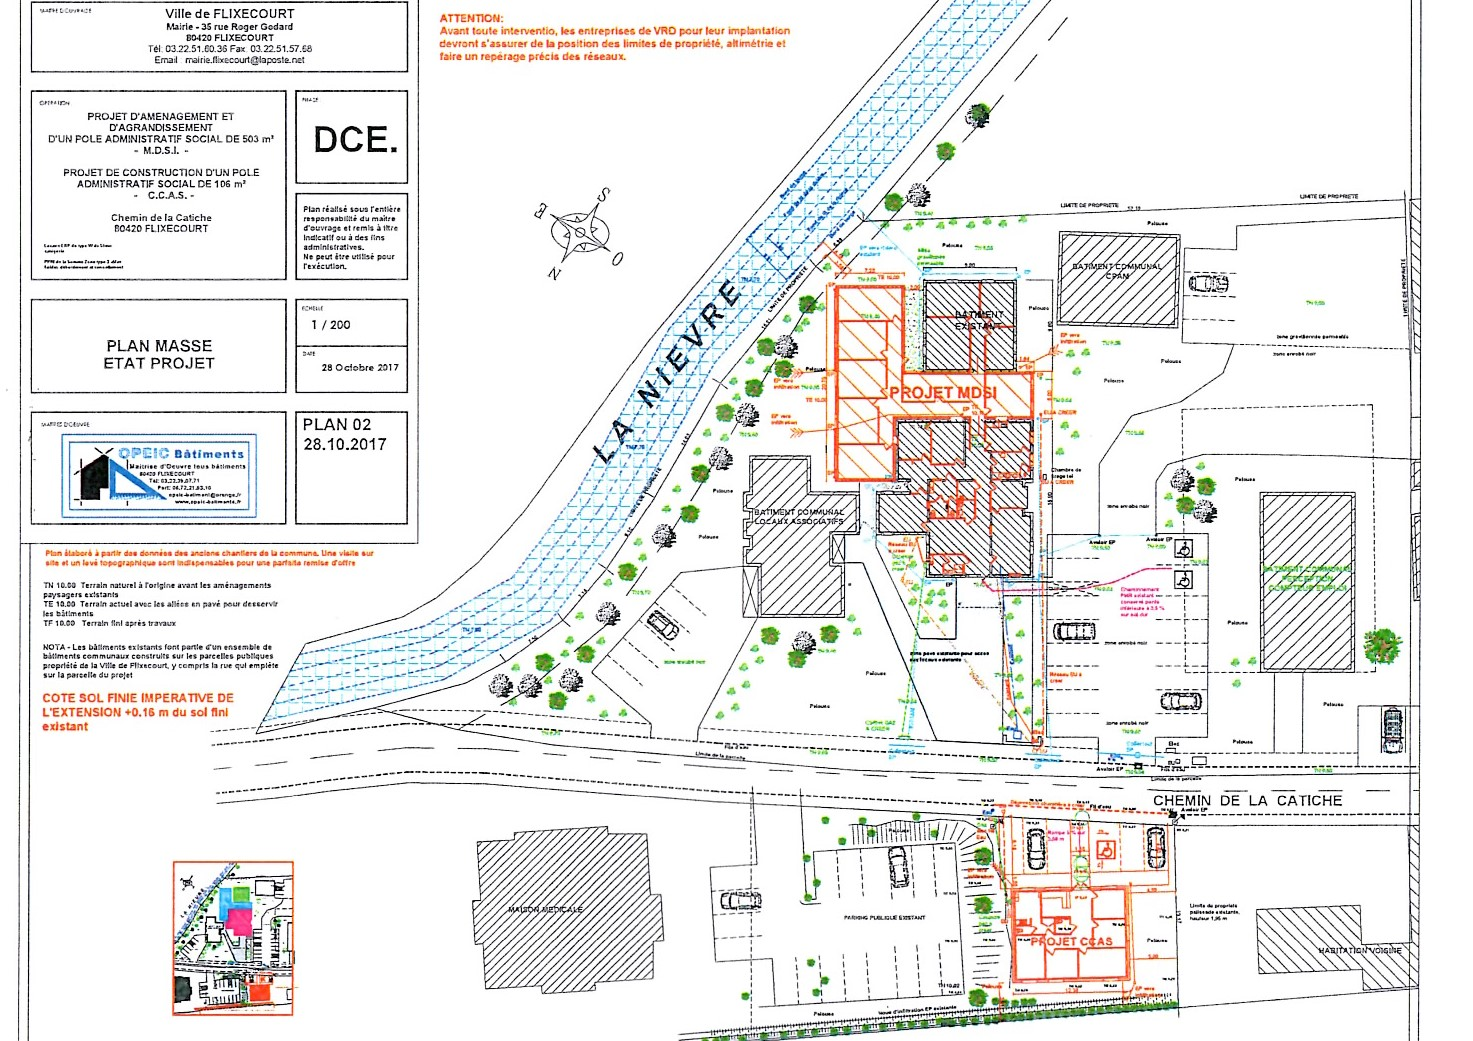 Plan de masse projet mdsi ccas mairie de flixecourt for Projet de plan